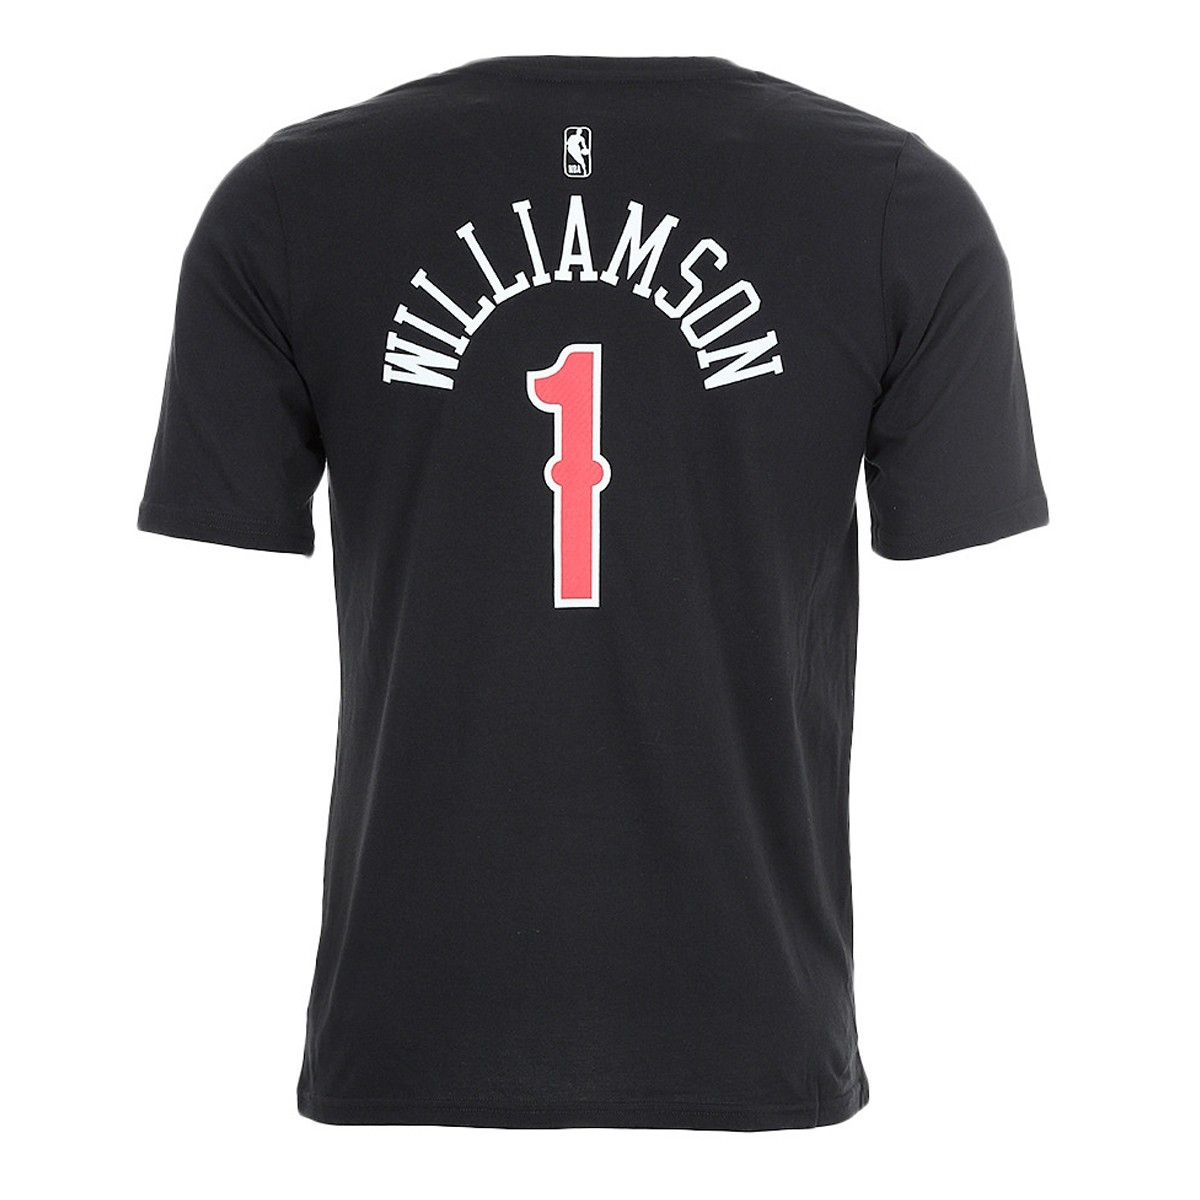 Nike NBA Junior Dark Icon 2.0 Tee Pelicans 'Williamson'-EZ2B7BCKS-NOZW